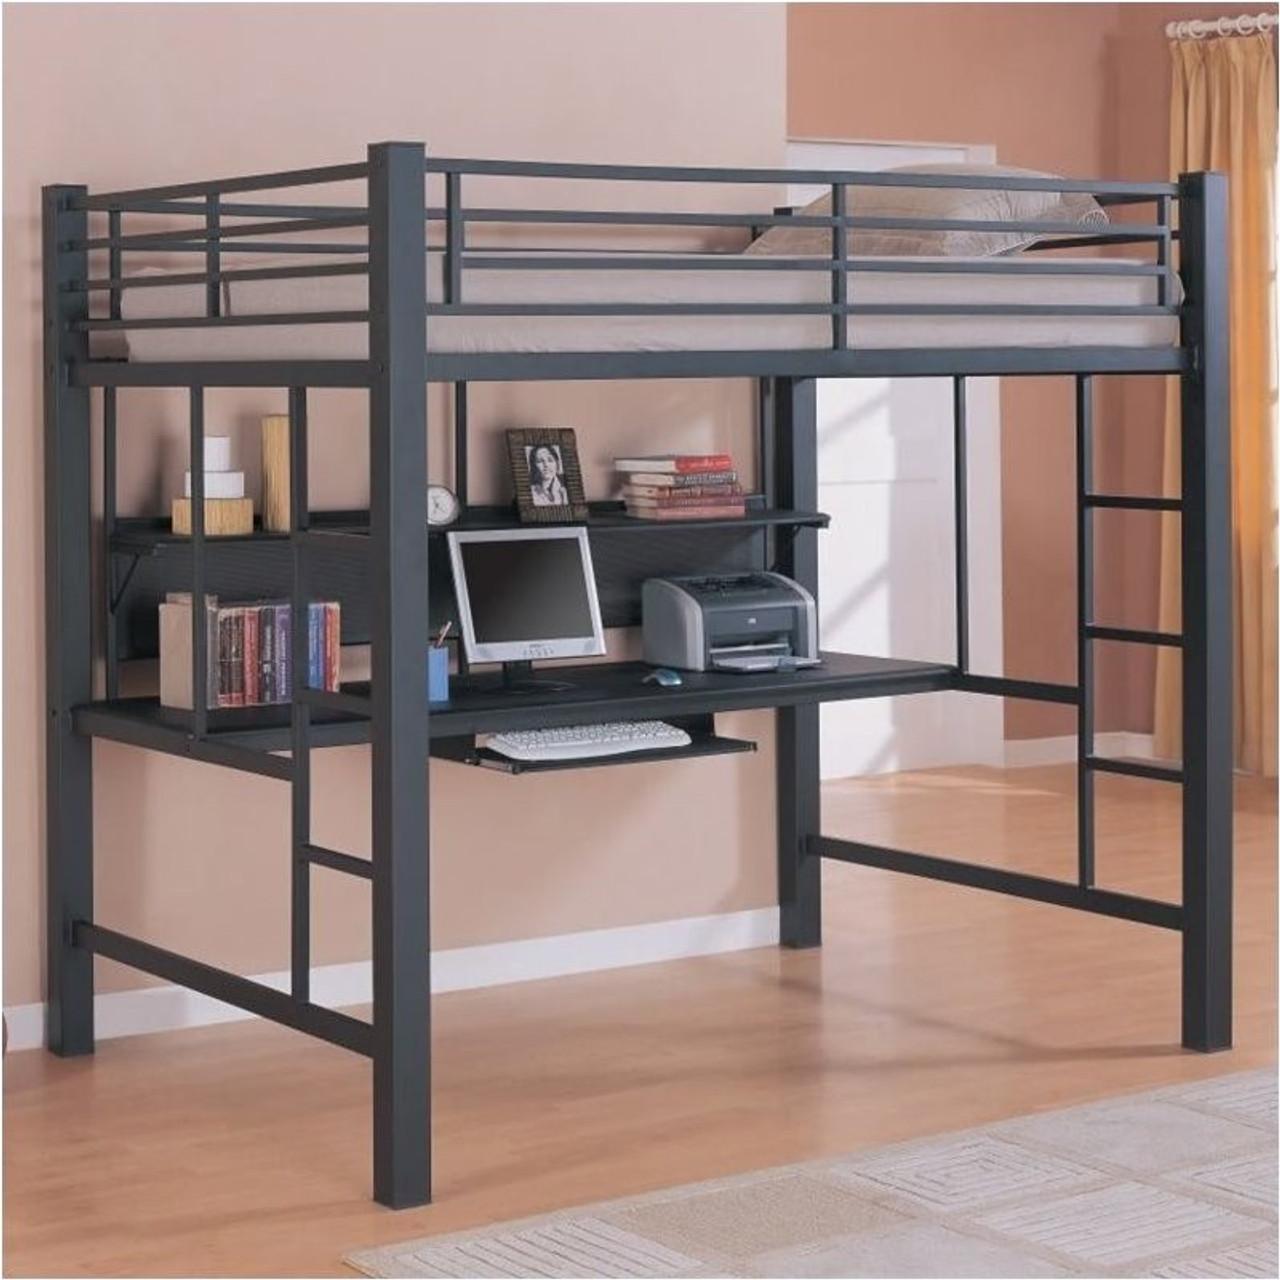 Coaster Safeguard Full Loft Bunk Bed With Workstation Dealbeds Com